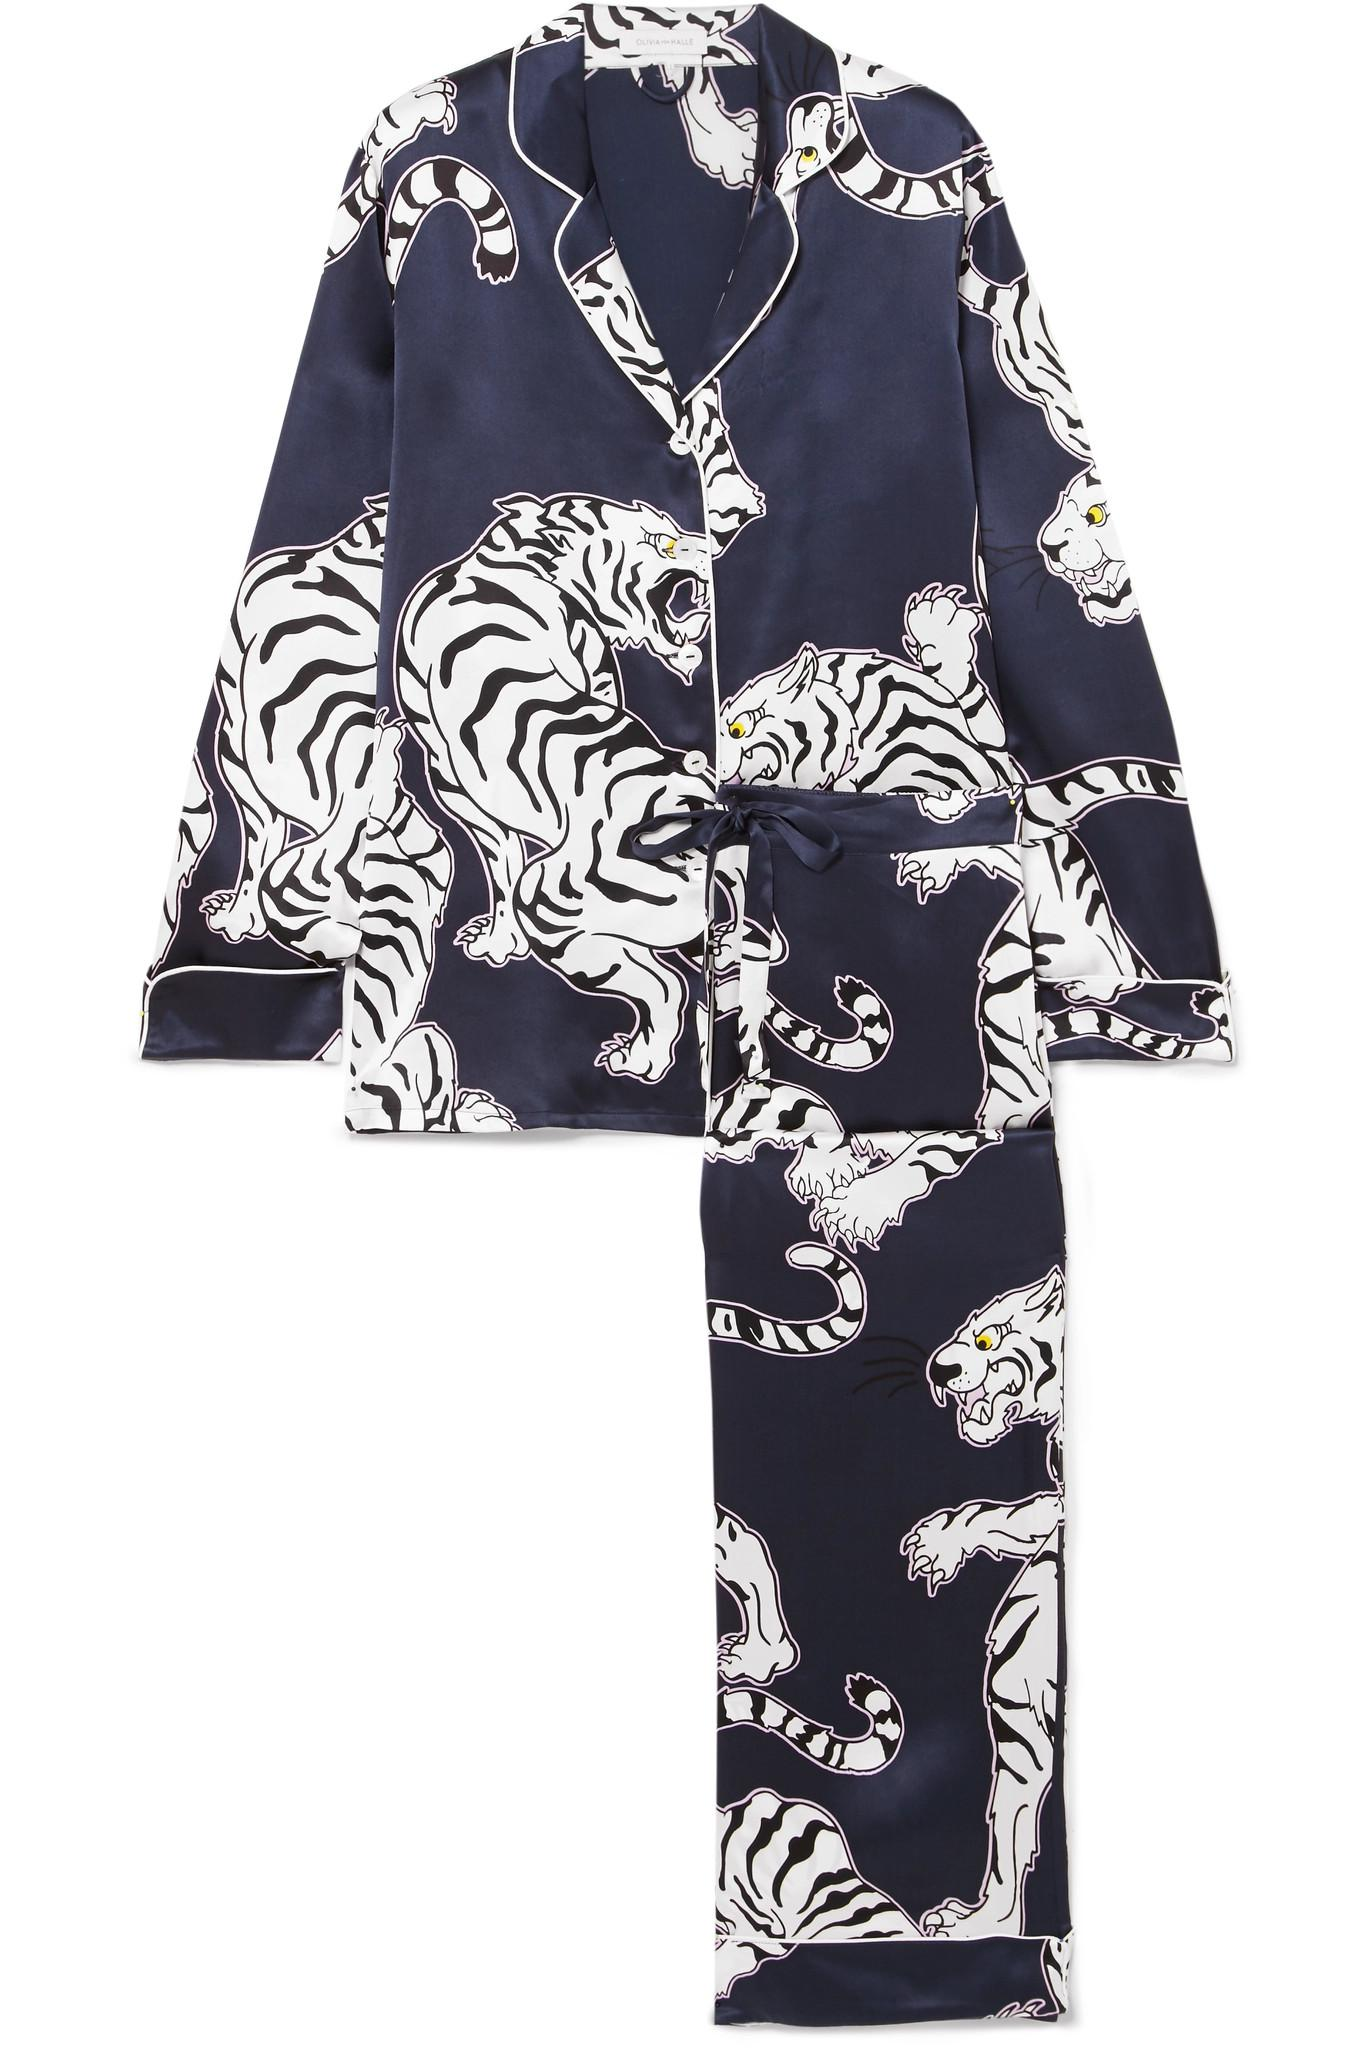 Lyst - Olivia Von Halle Lila Printed Silk-satin Pajama Set in Blue 0d33830e8